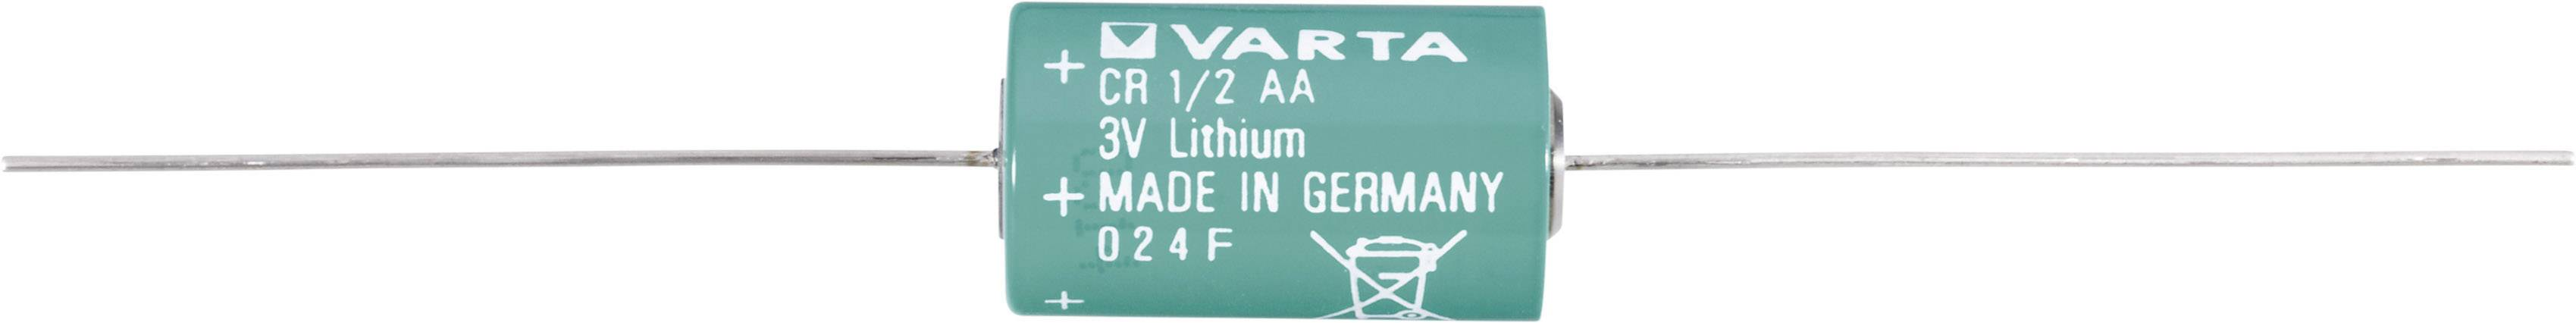 Špeciálny typ batérie CR 1/2 AA CD lítium, Varta CR1/2 AA CD, 970 mAh, 3 V, 1 ks